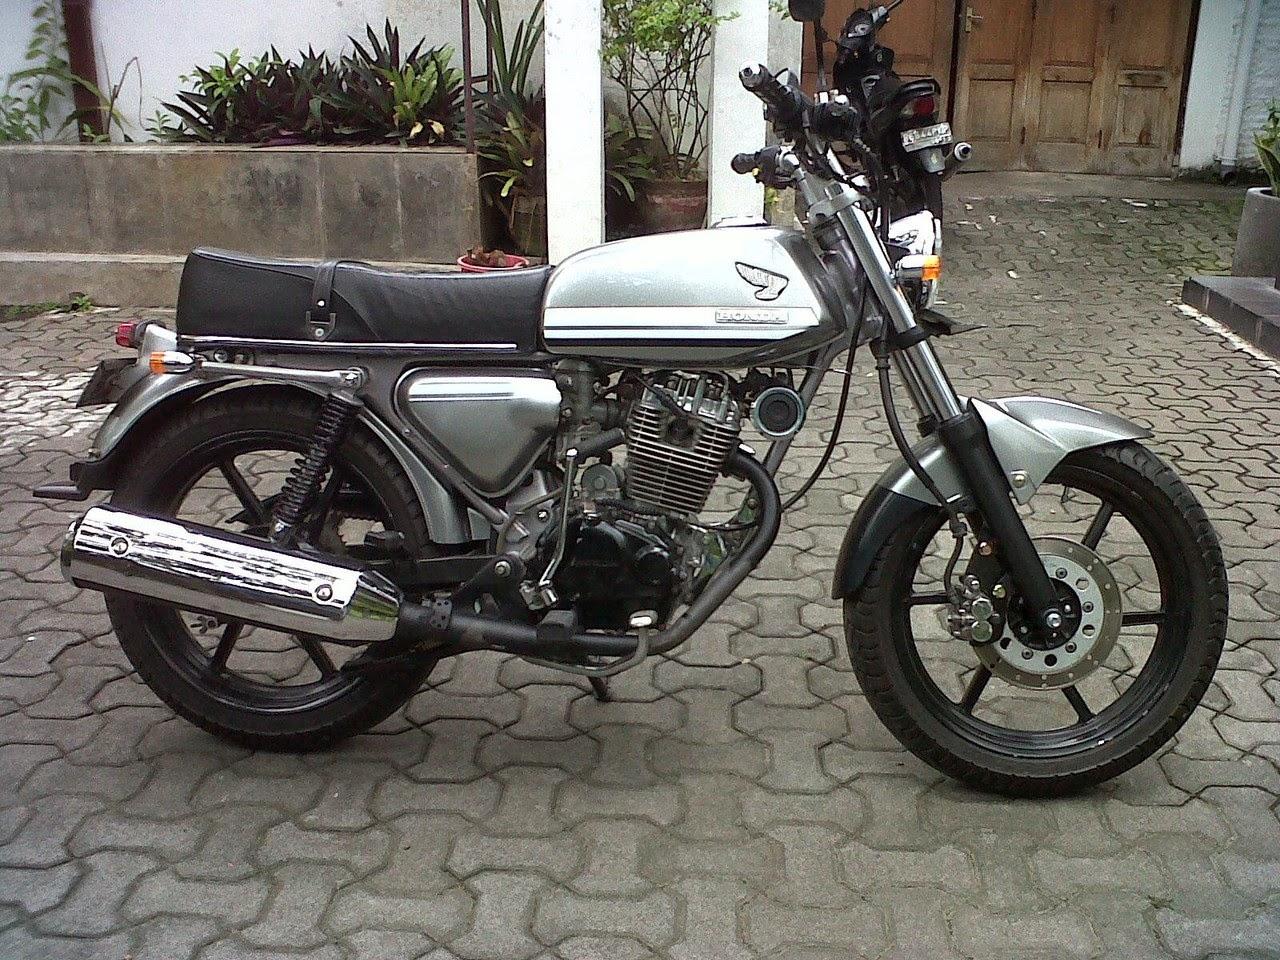 106 Modifikasi Motor Tiger Menjadi Cb Modifikasi Motor Honda CB